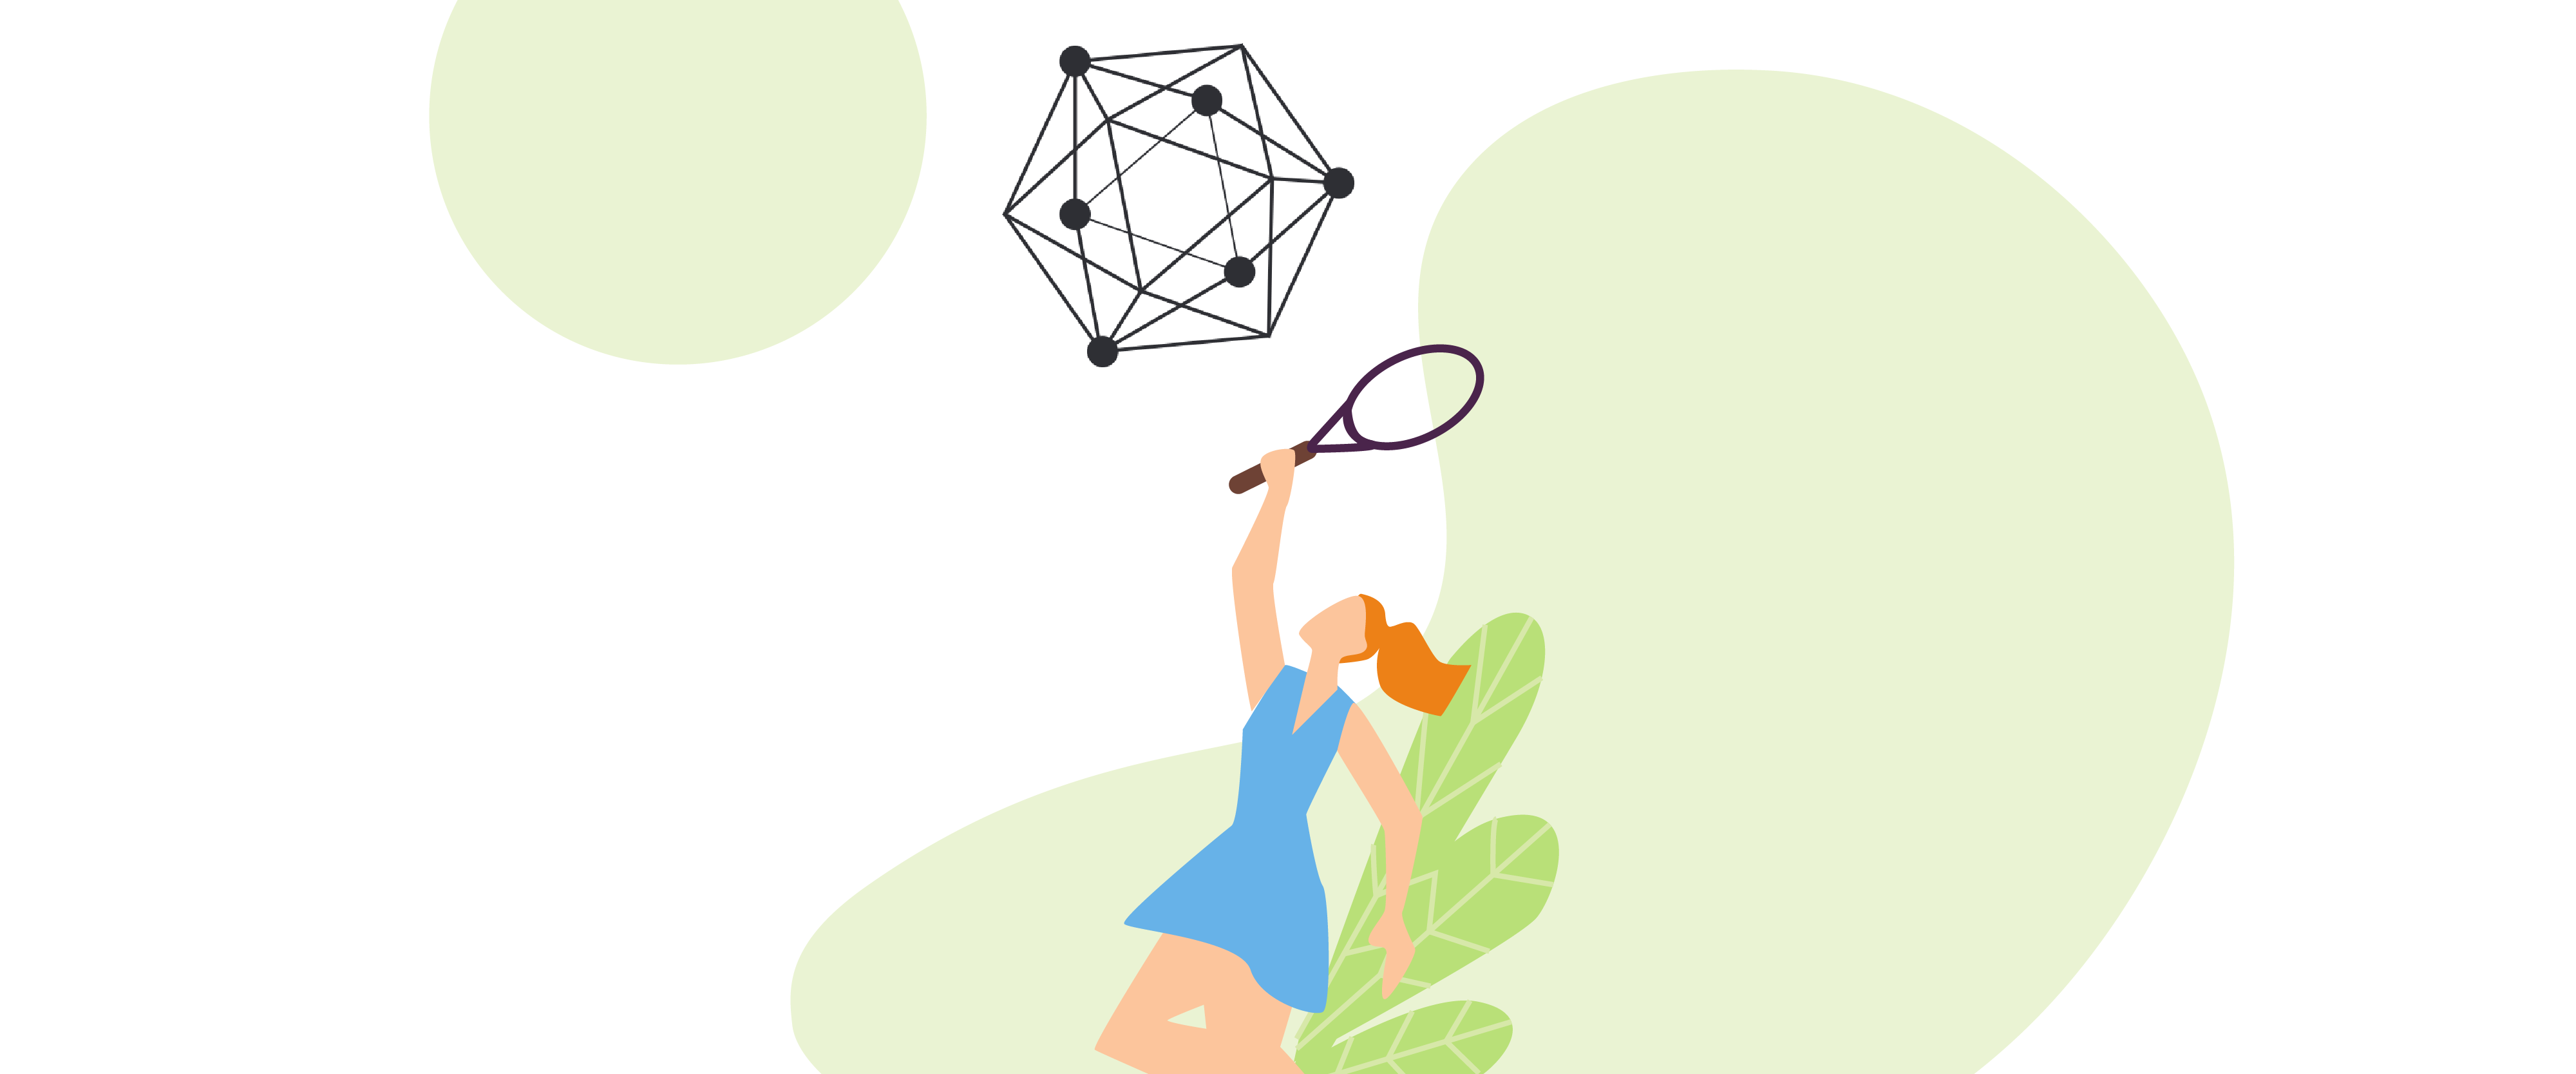 Hyperledger Fabric blockchain